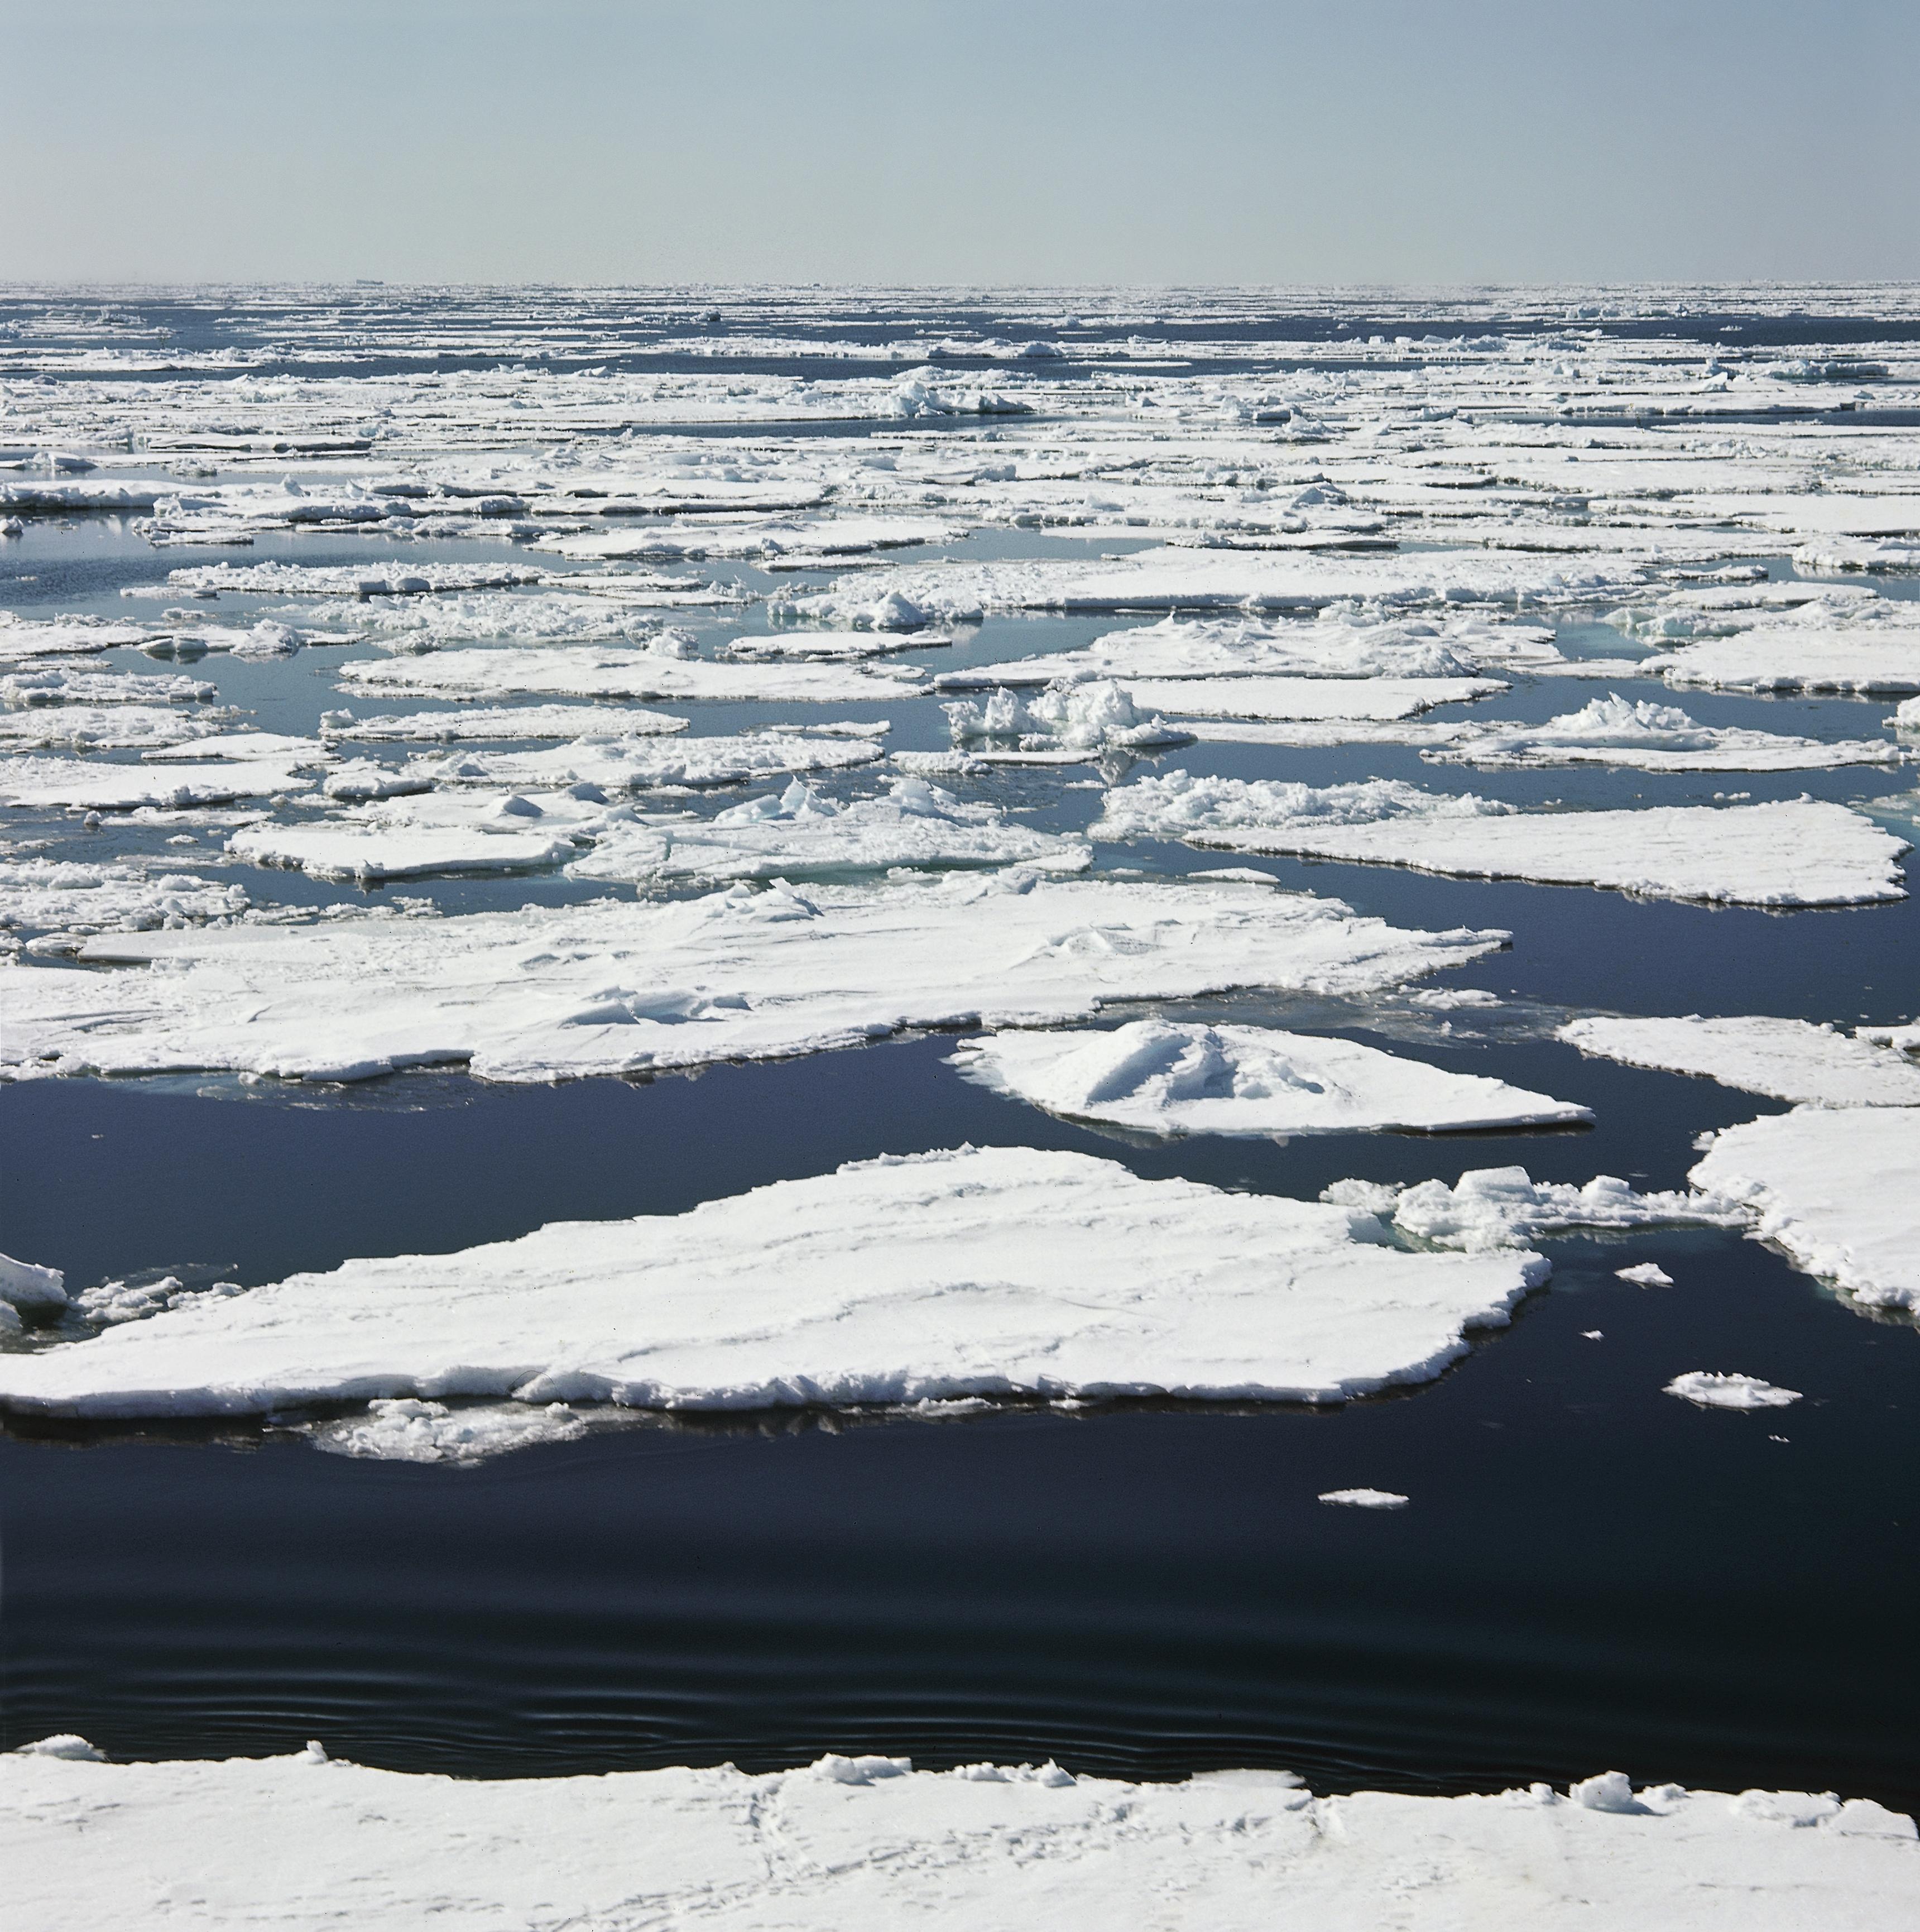 Ice floating in Ross Sea, Antarctica on June 15, 2014.